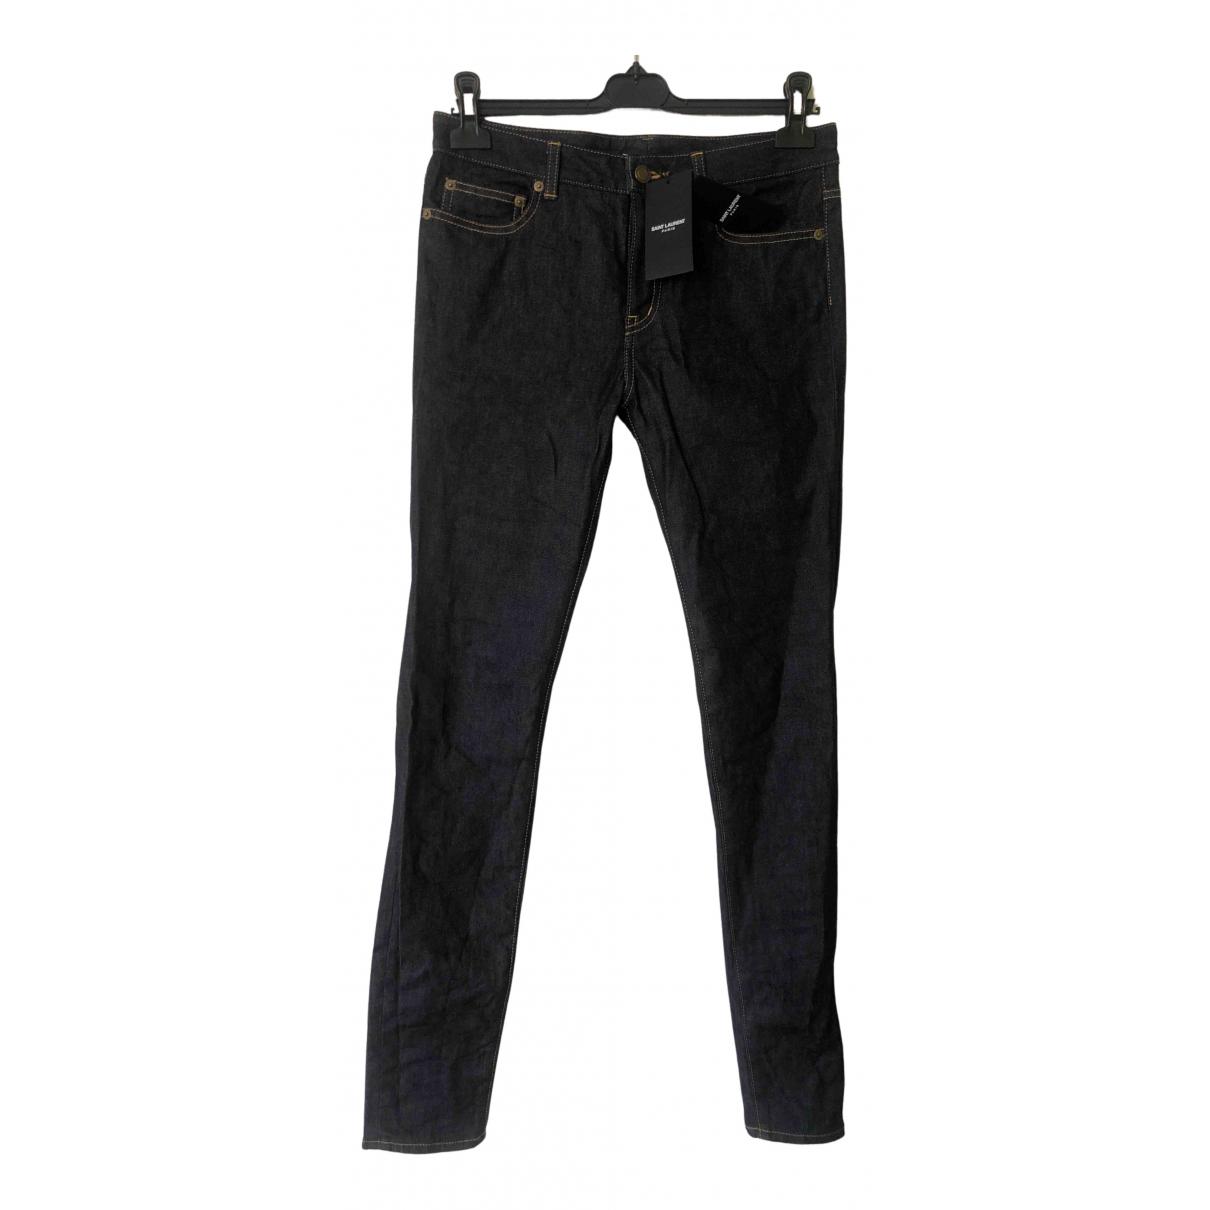 Saint Laurent \N Navy Cotton - elasthane Jeans for Women 30 US